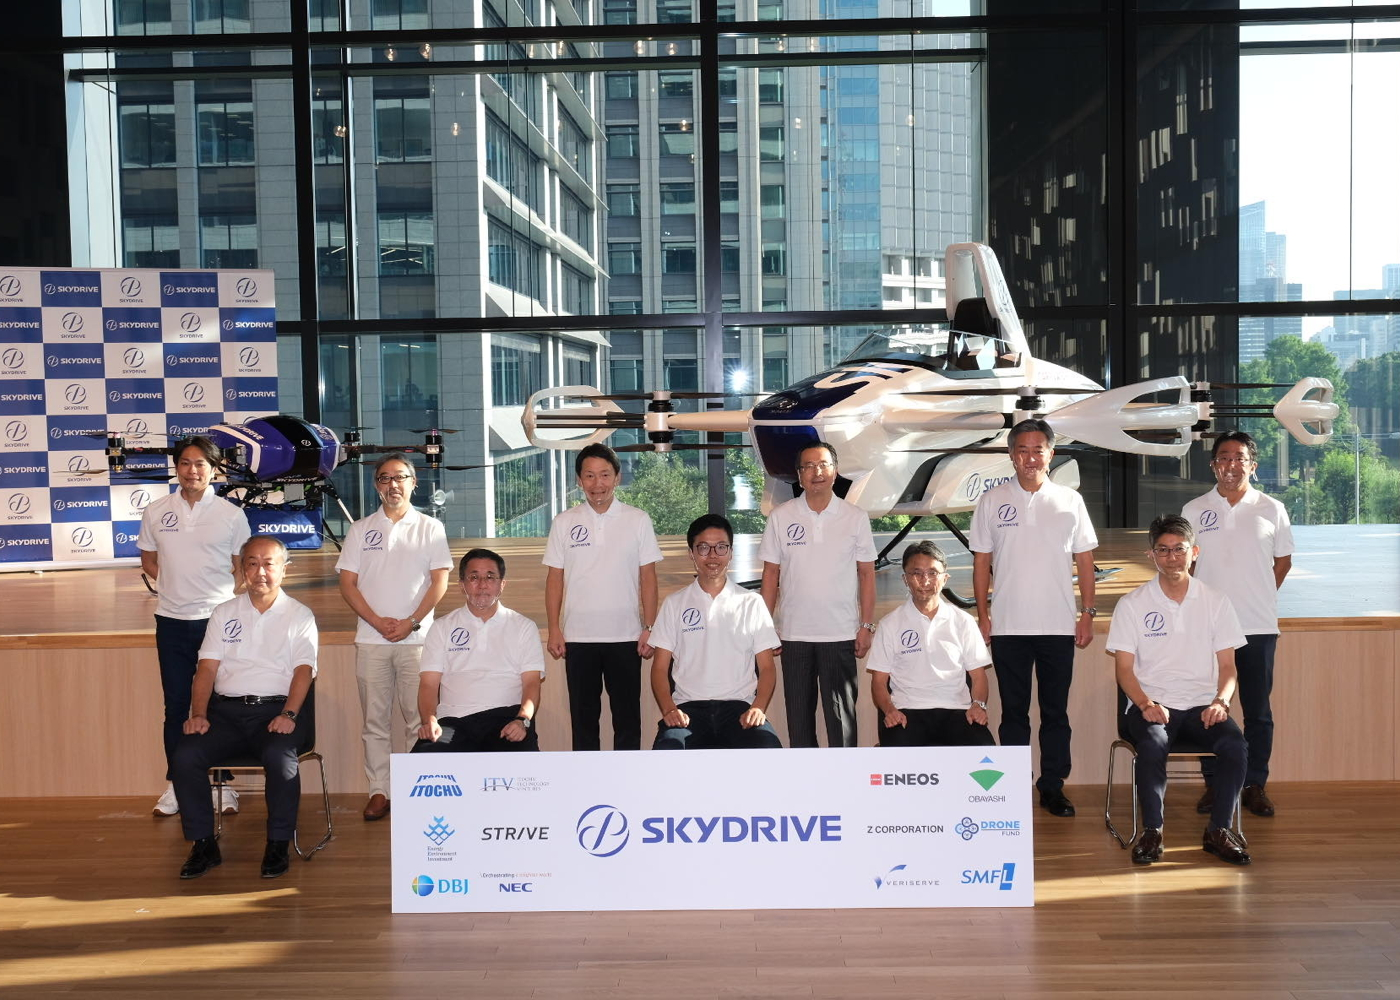 SkyDrive fundraising